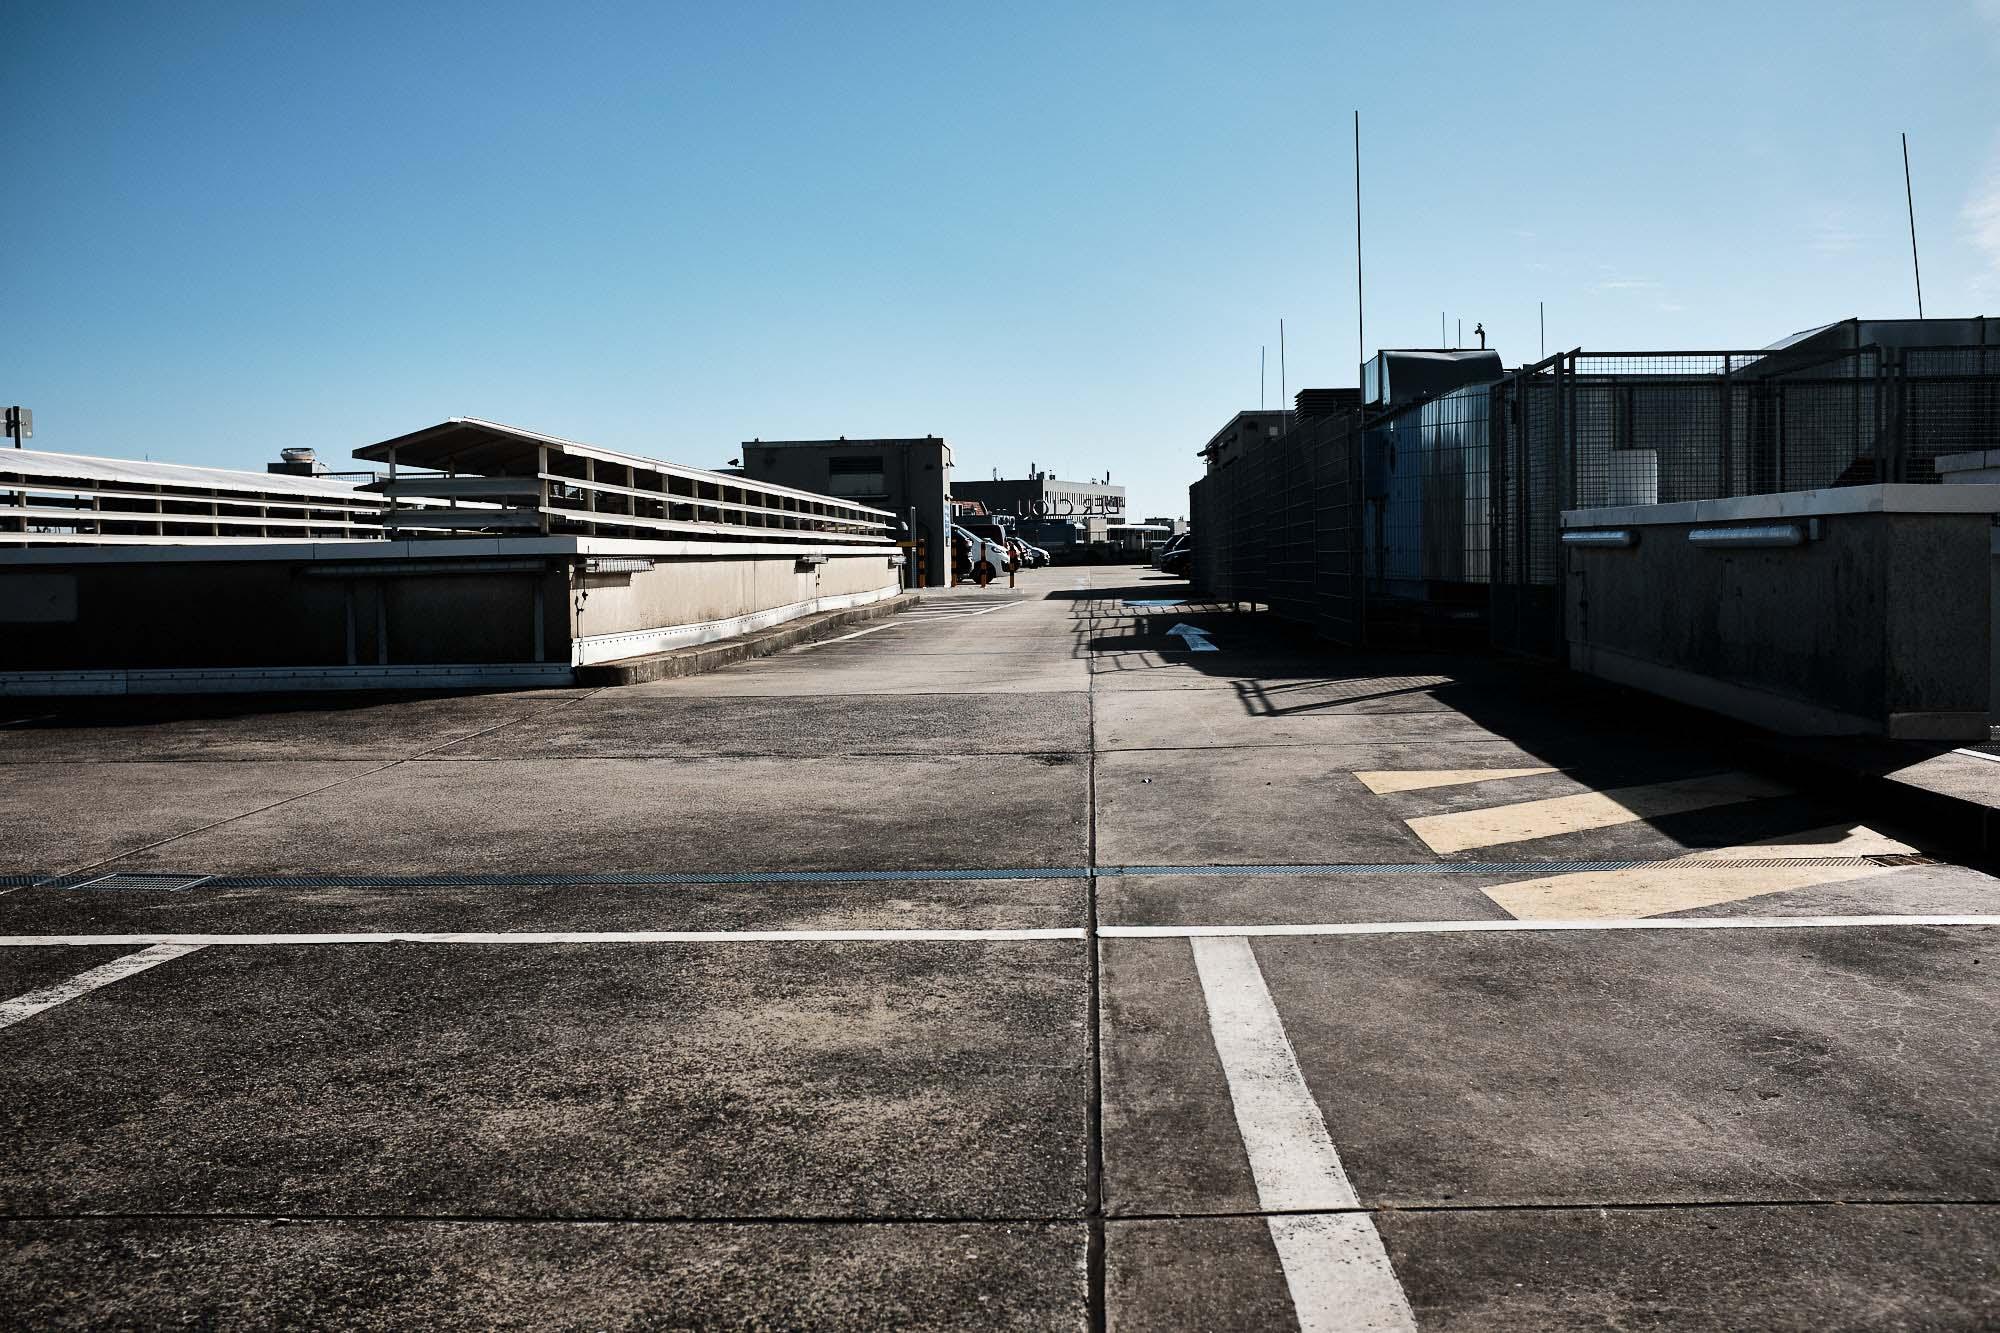 Photoauge / Parkplatz